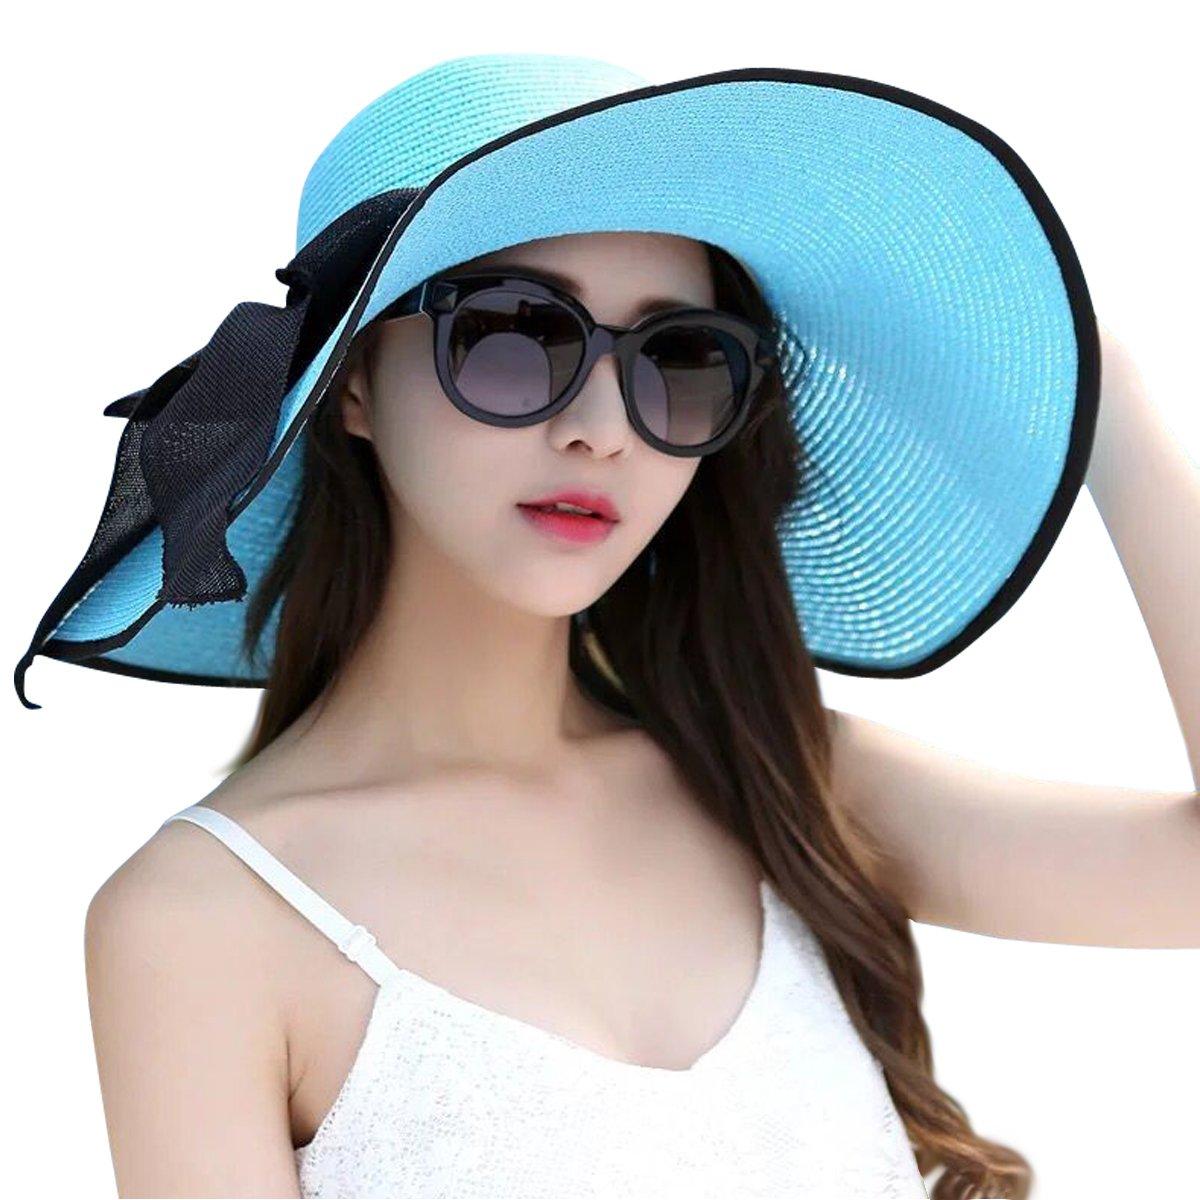 JOYEBUY Women's Floppy Big Brim Hat Bowknot Straw Hat Foldable Roll up Sun Hat strawhat0026